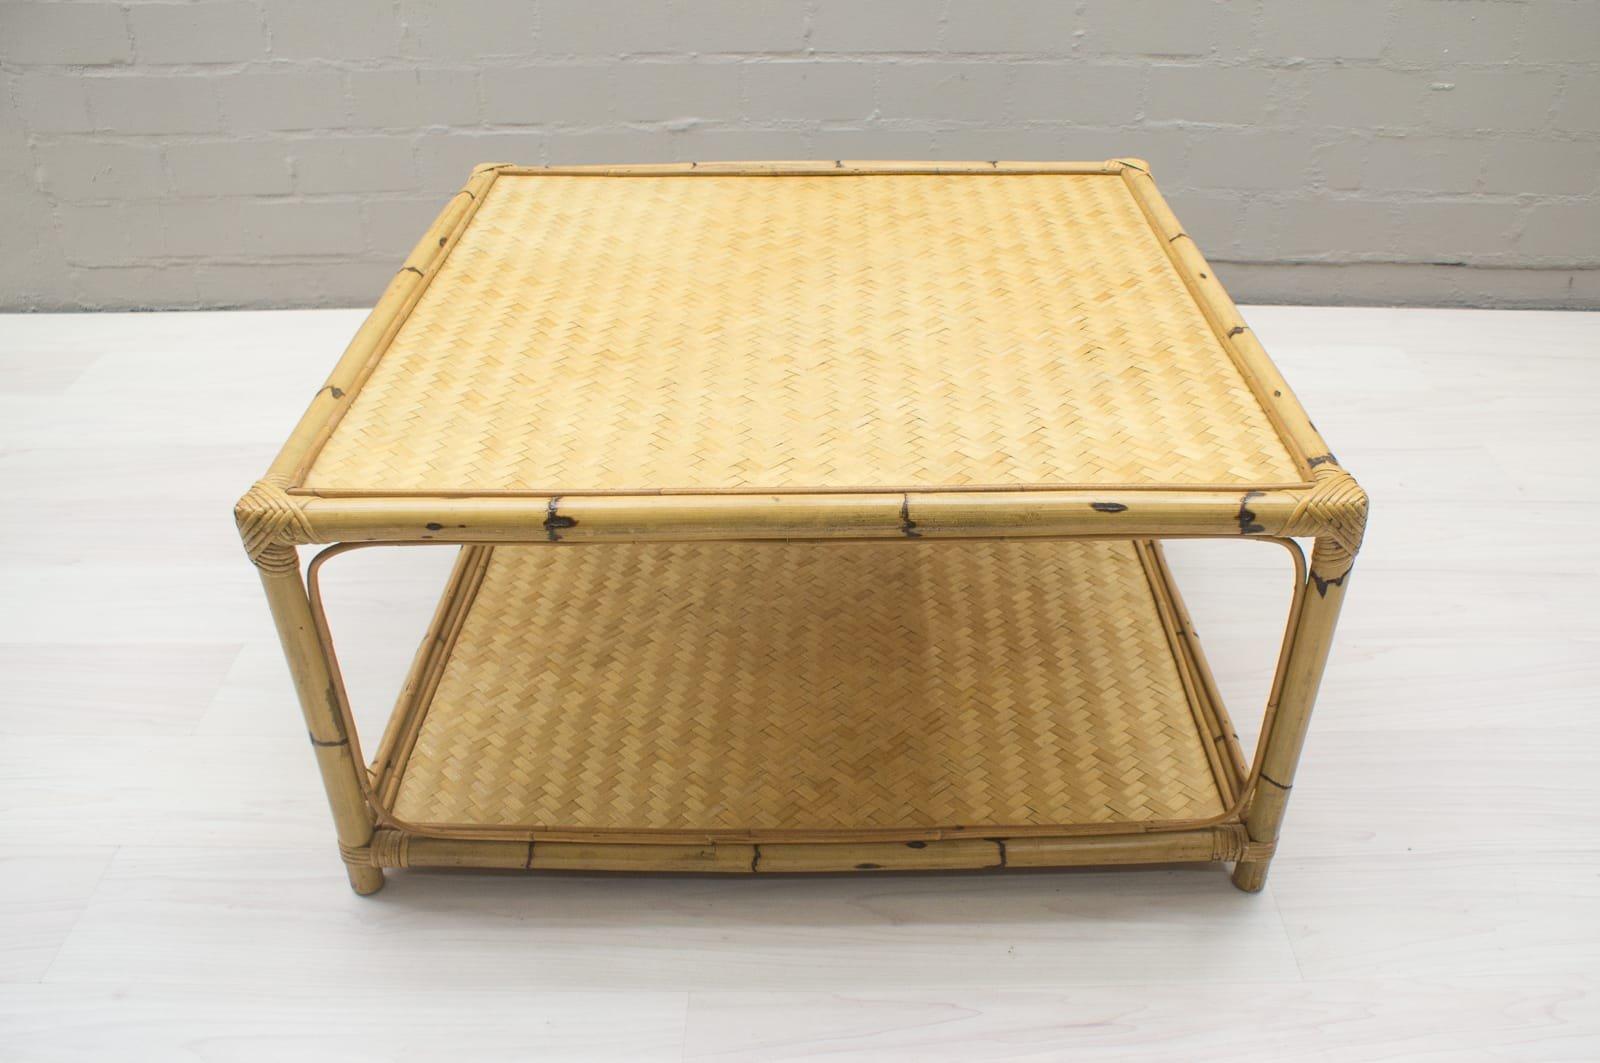 Large Bamboo Rattan Coffee Table 1960s 9 421 00